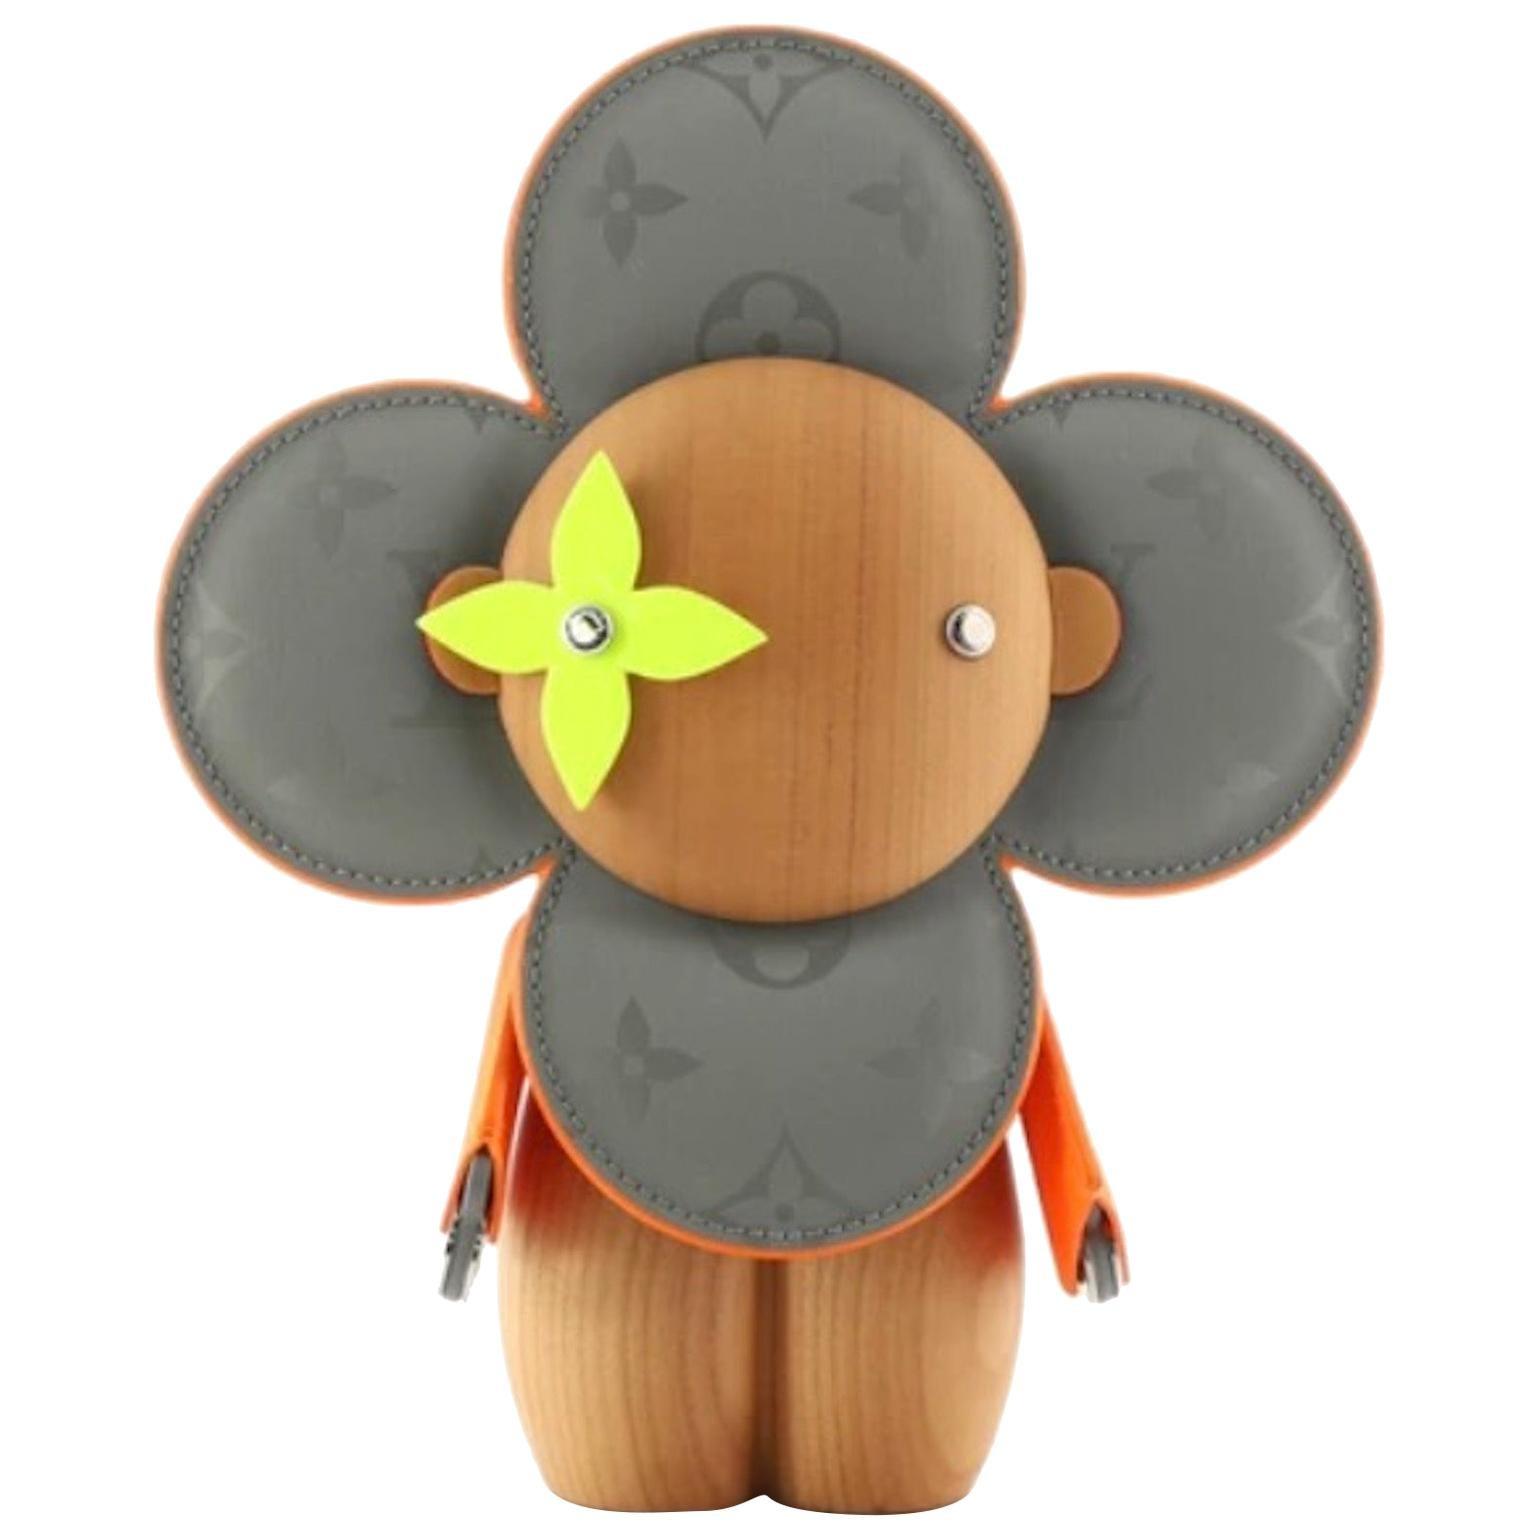 Louis Vuitton NEW Orange Gray Monogram Figurine Decorative Bear Toy in Box